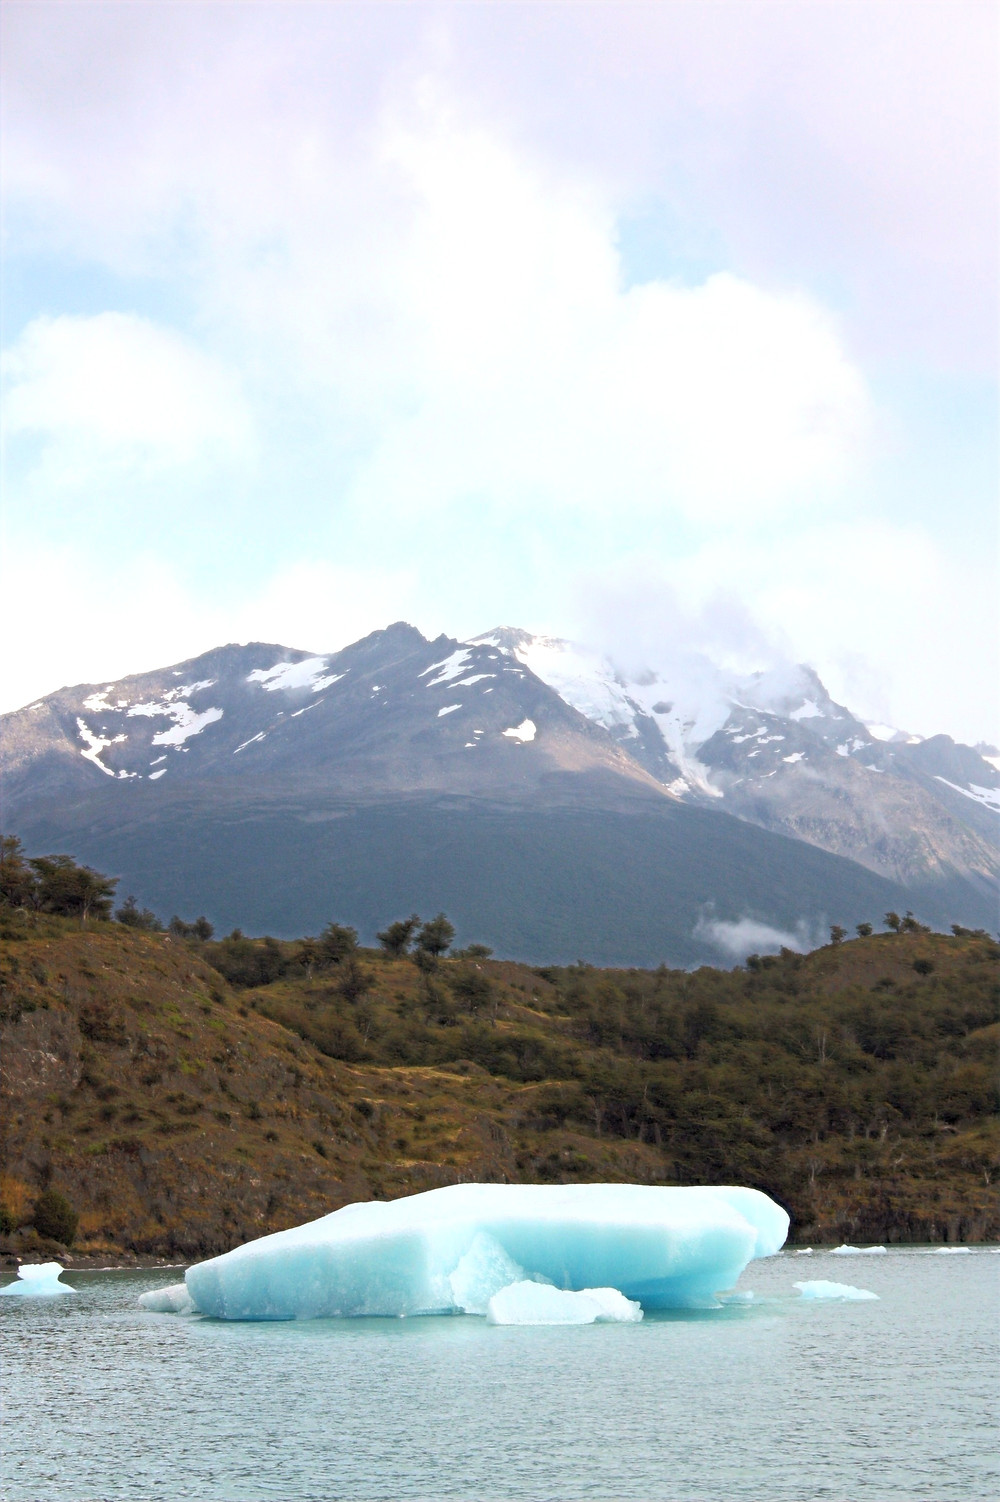 Iceberg no Lago Argentino